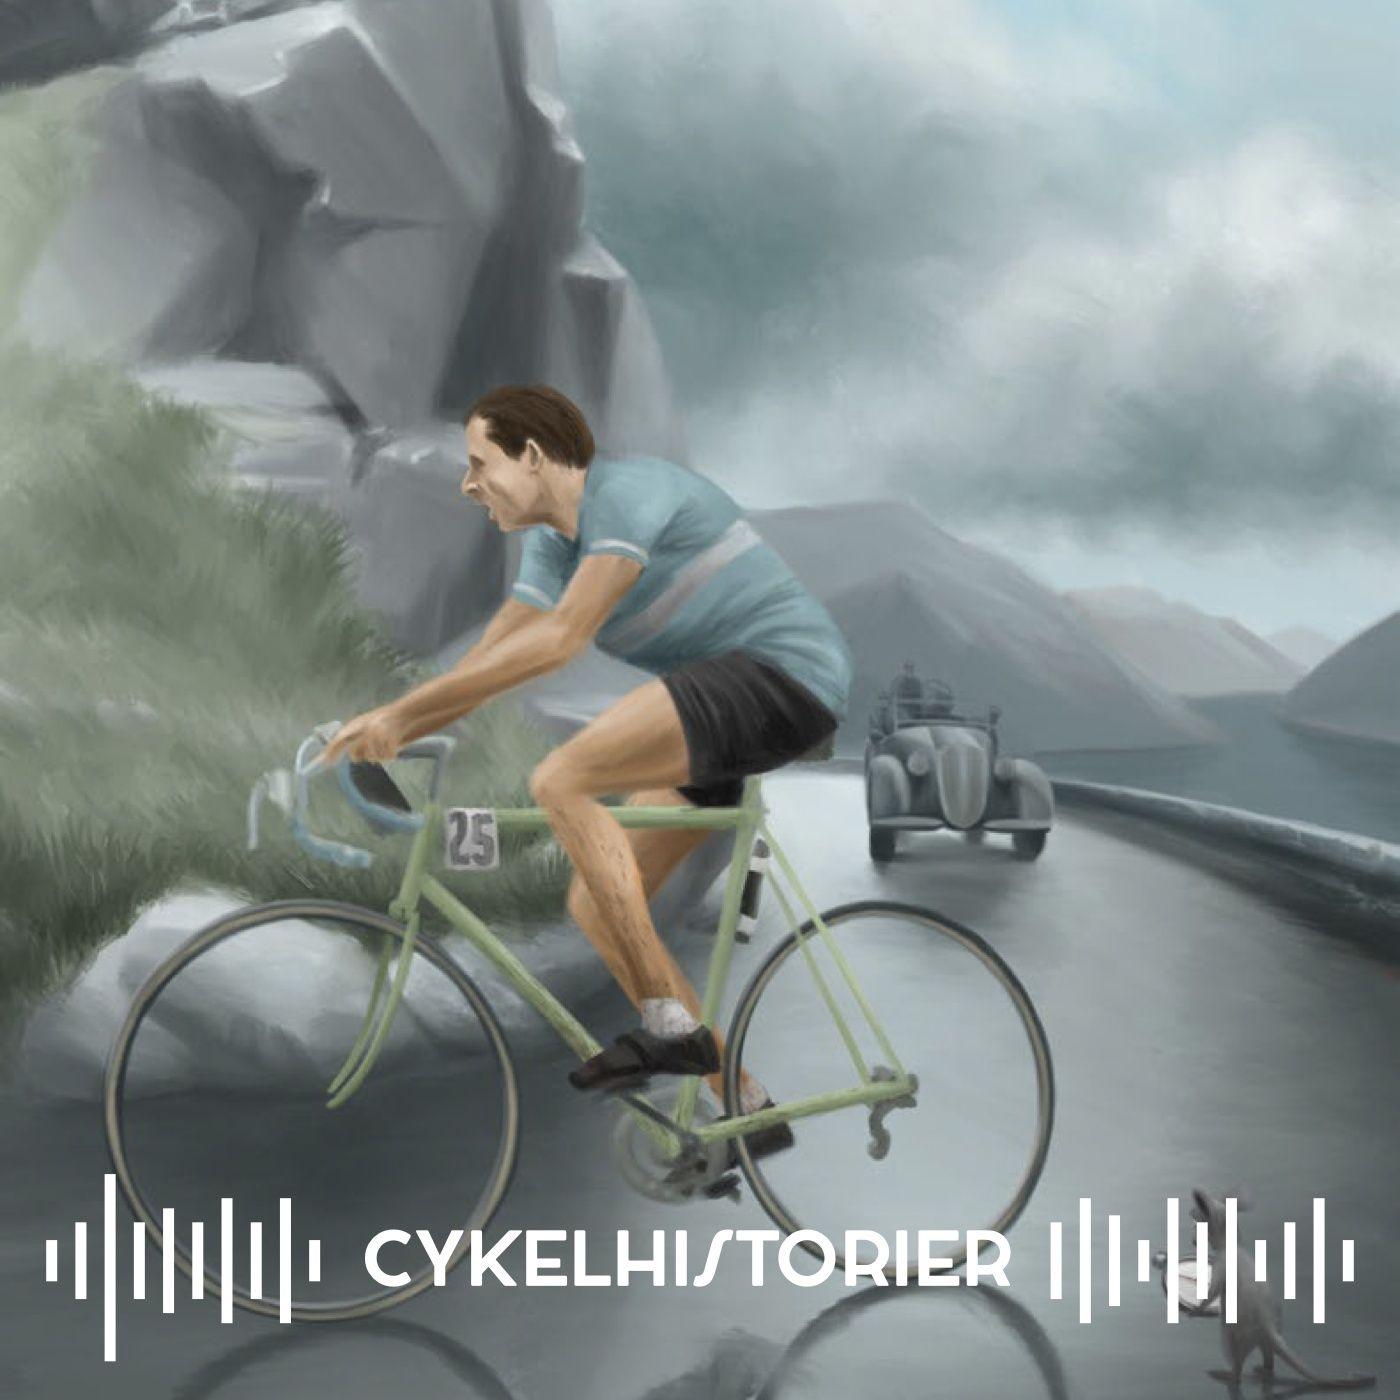 EP12 Hævnen i Himlen · Fausto Coppi · VM i Valkenburg og Lombardiet Rundt 1948